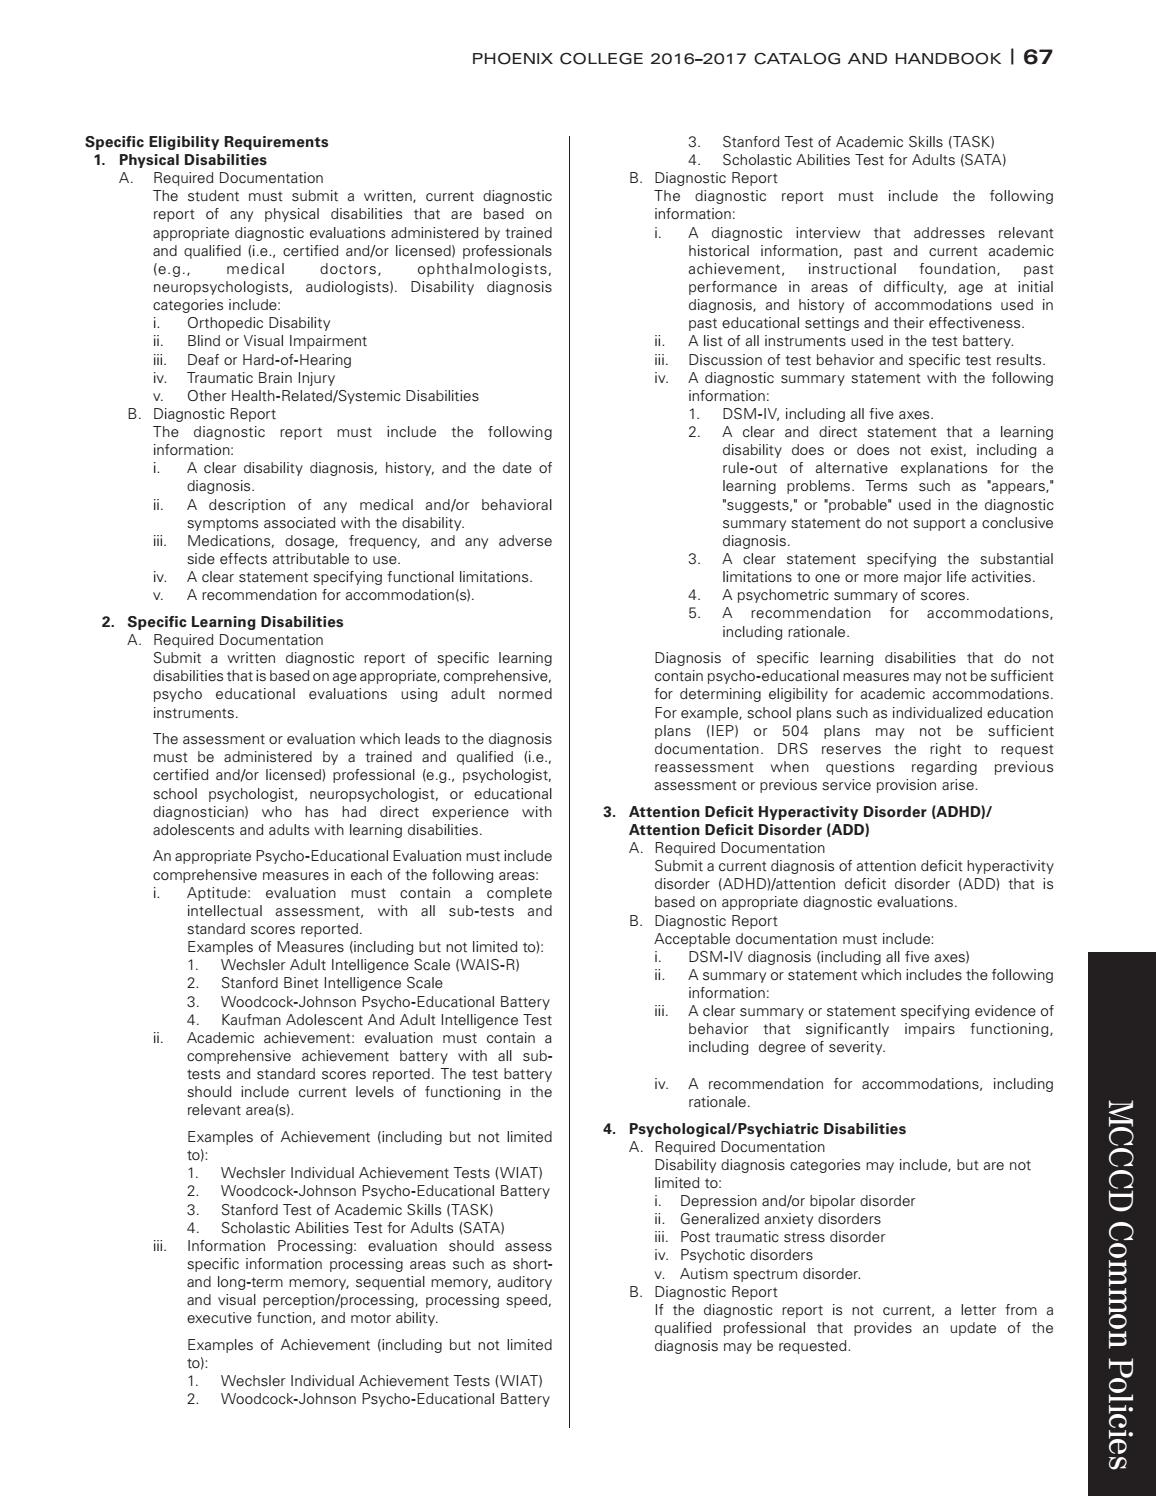 Phoenix College 2016 17 Catalog Handbook By The Maricopa Community